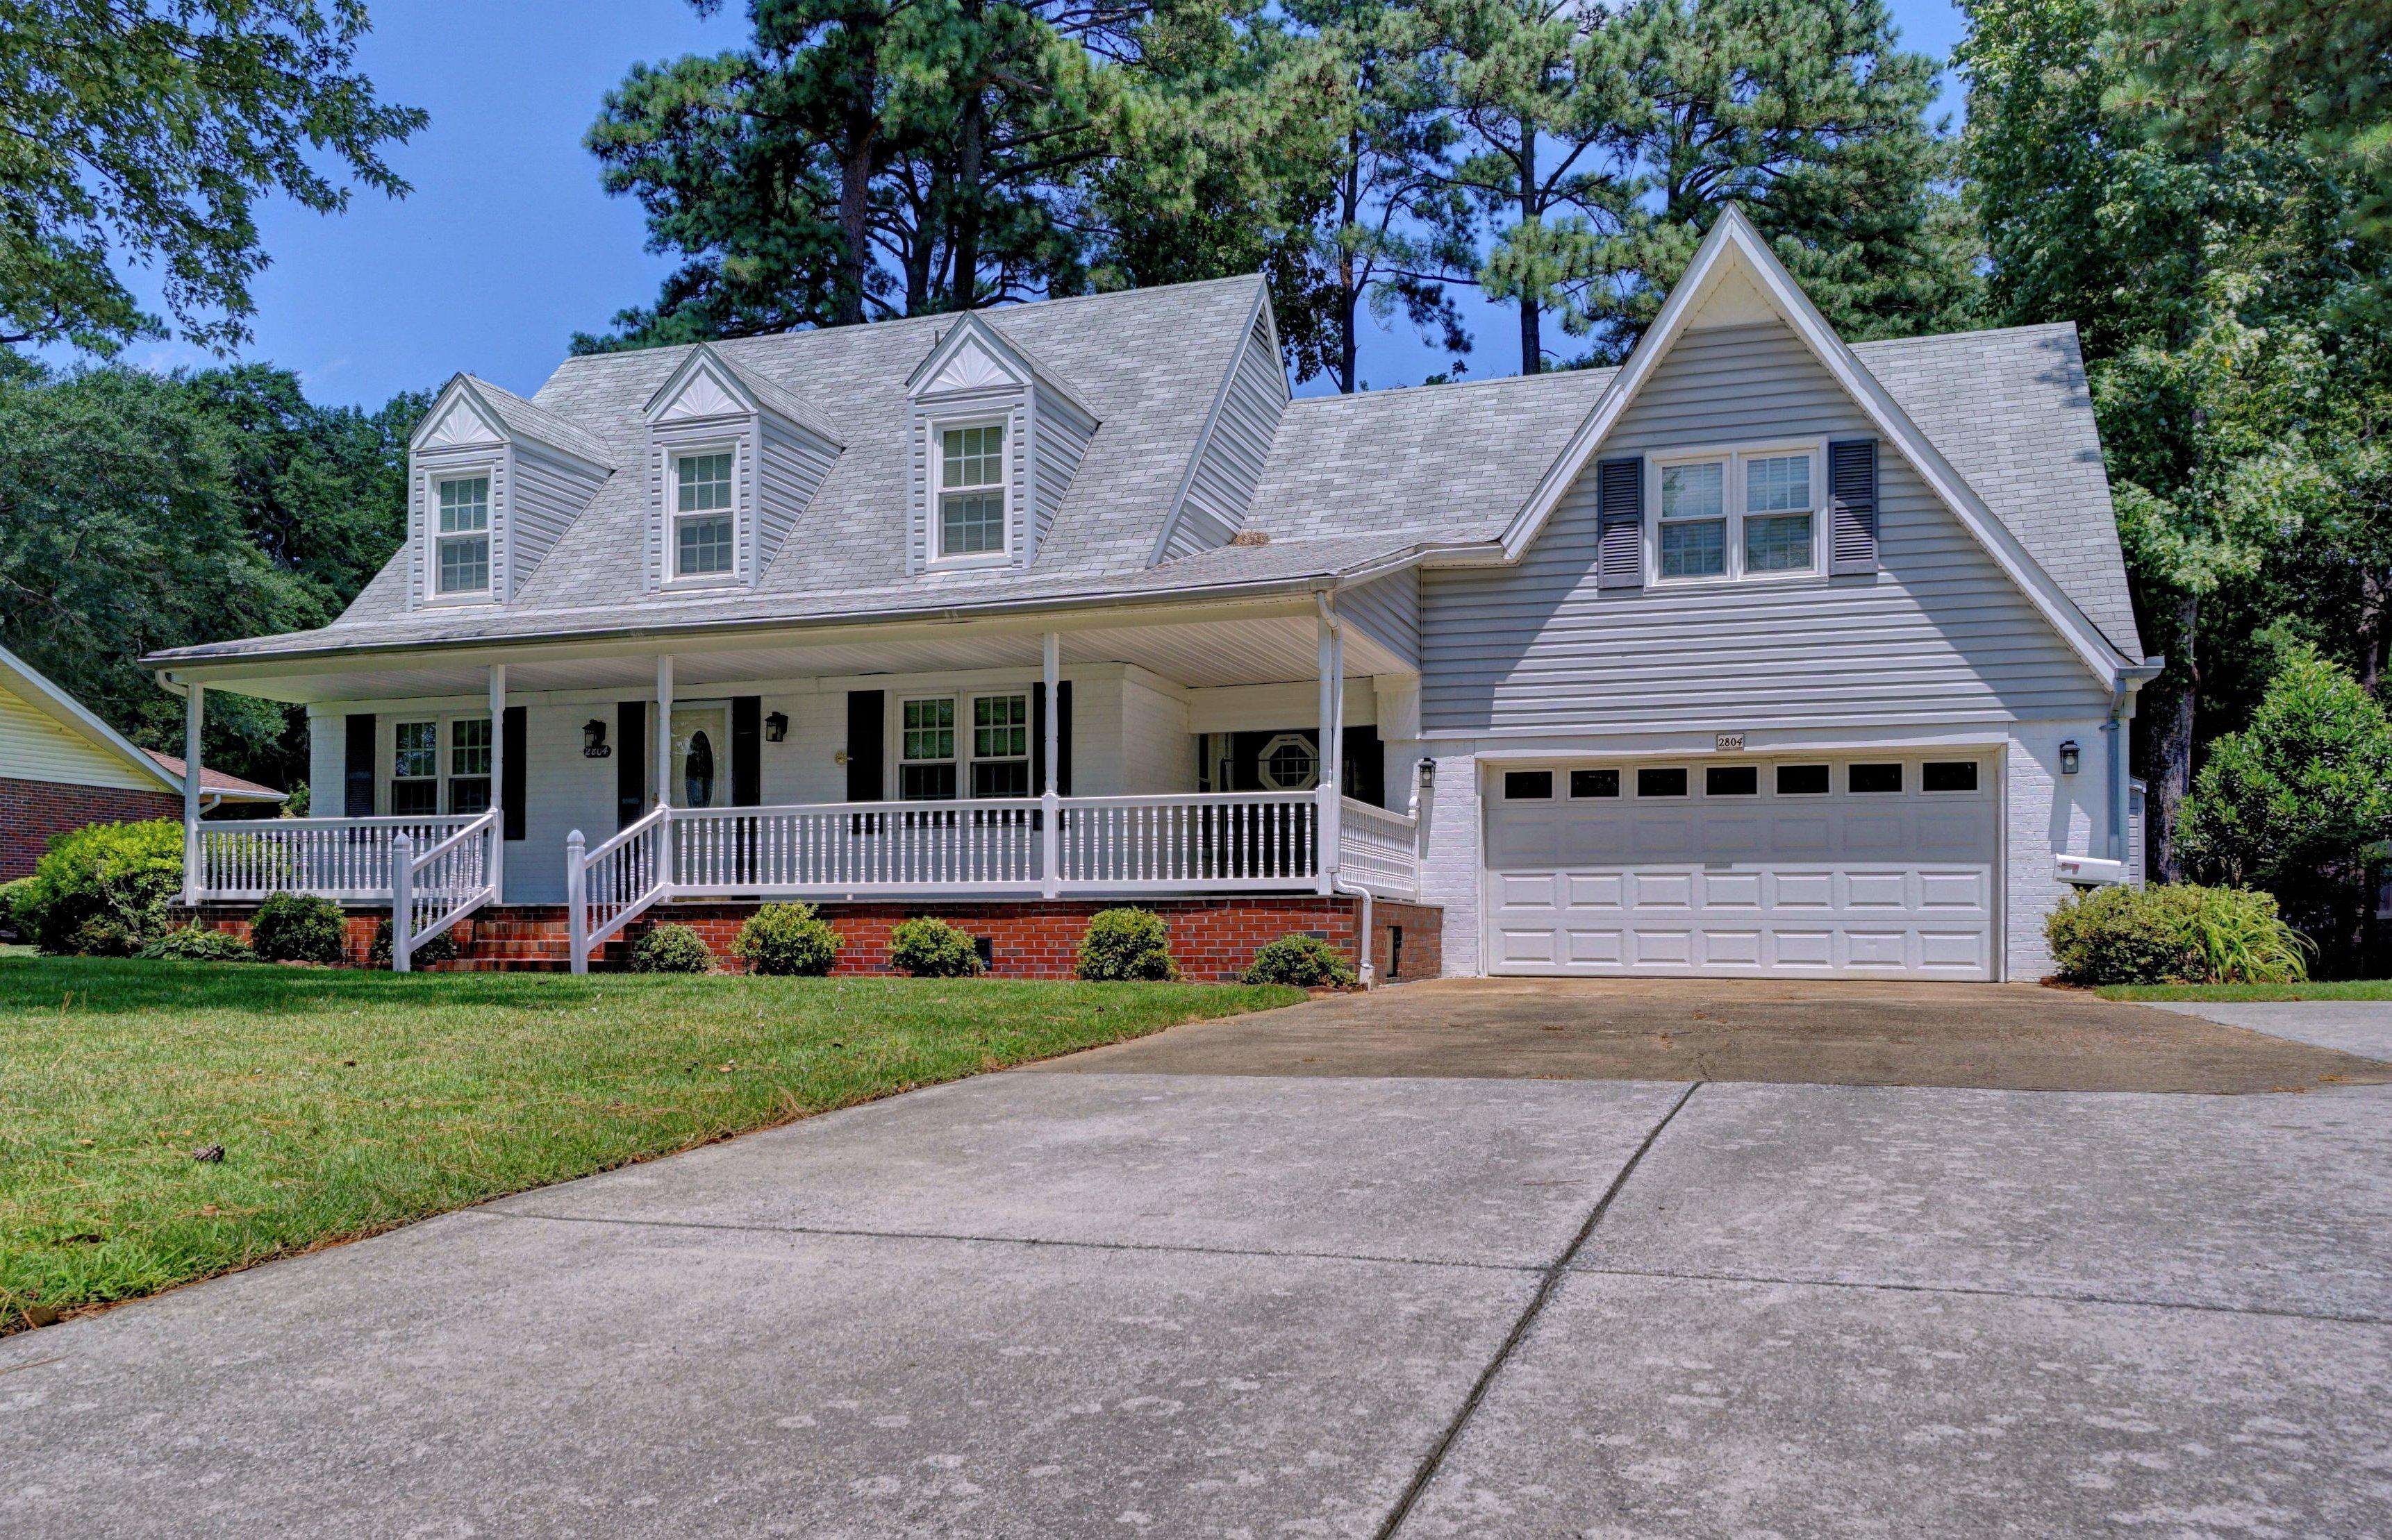 2804 Queen Anne Road: $449,000